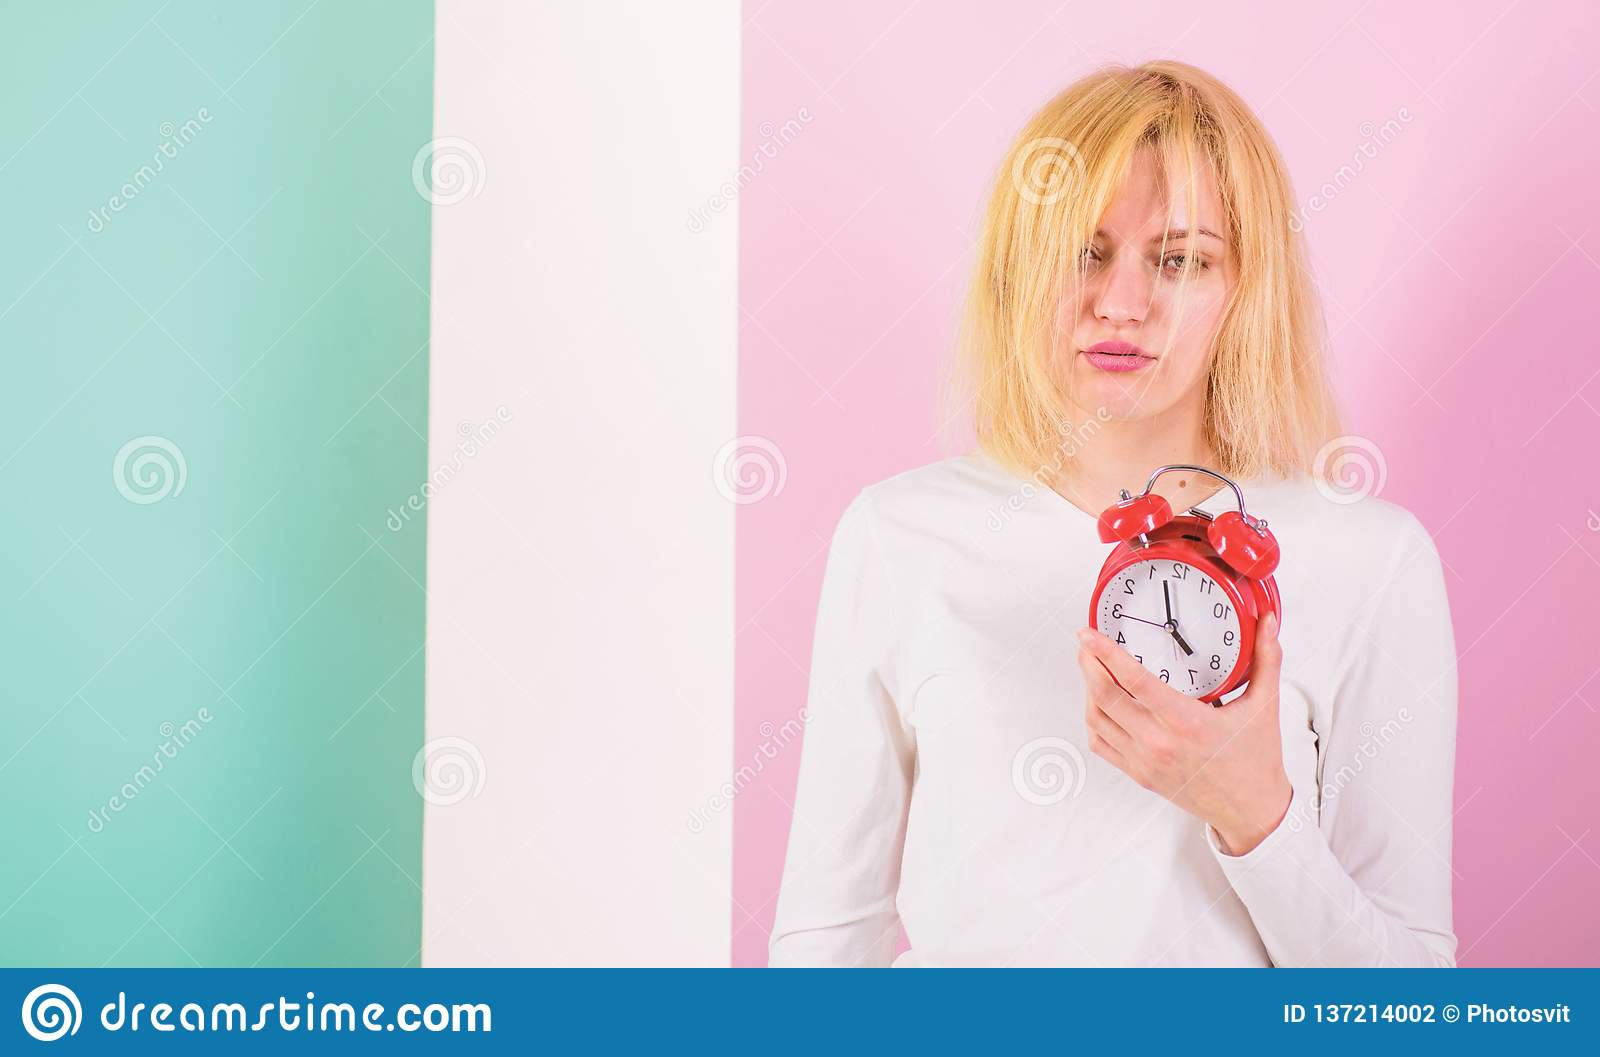 One more awful awakening. Lack of sleep bad for health. Oversleeping side effects too much sleep harmful. Girl drowsy